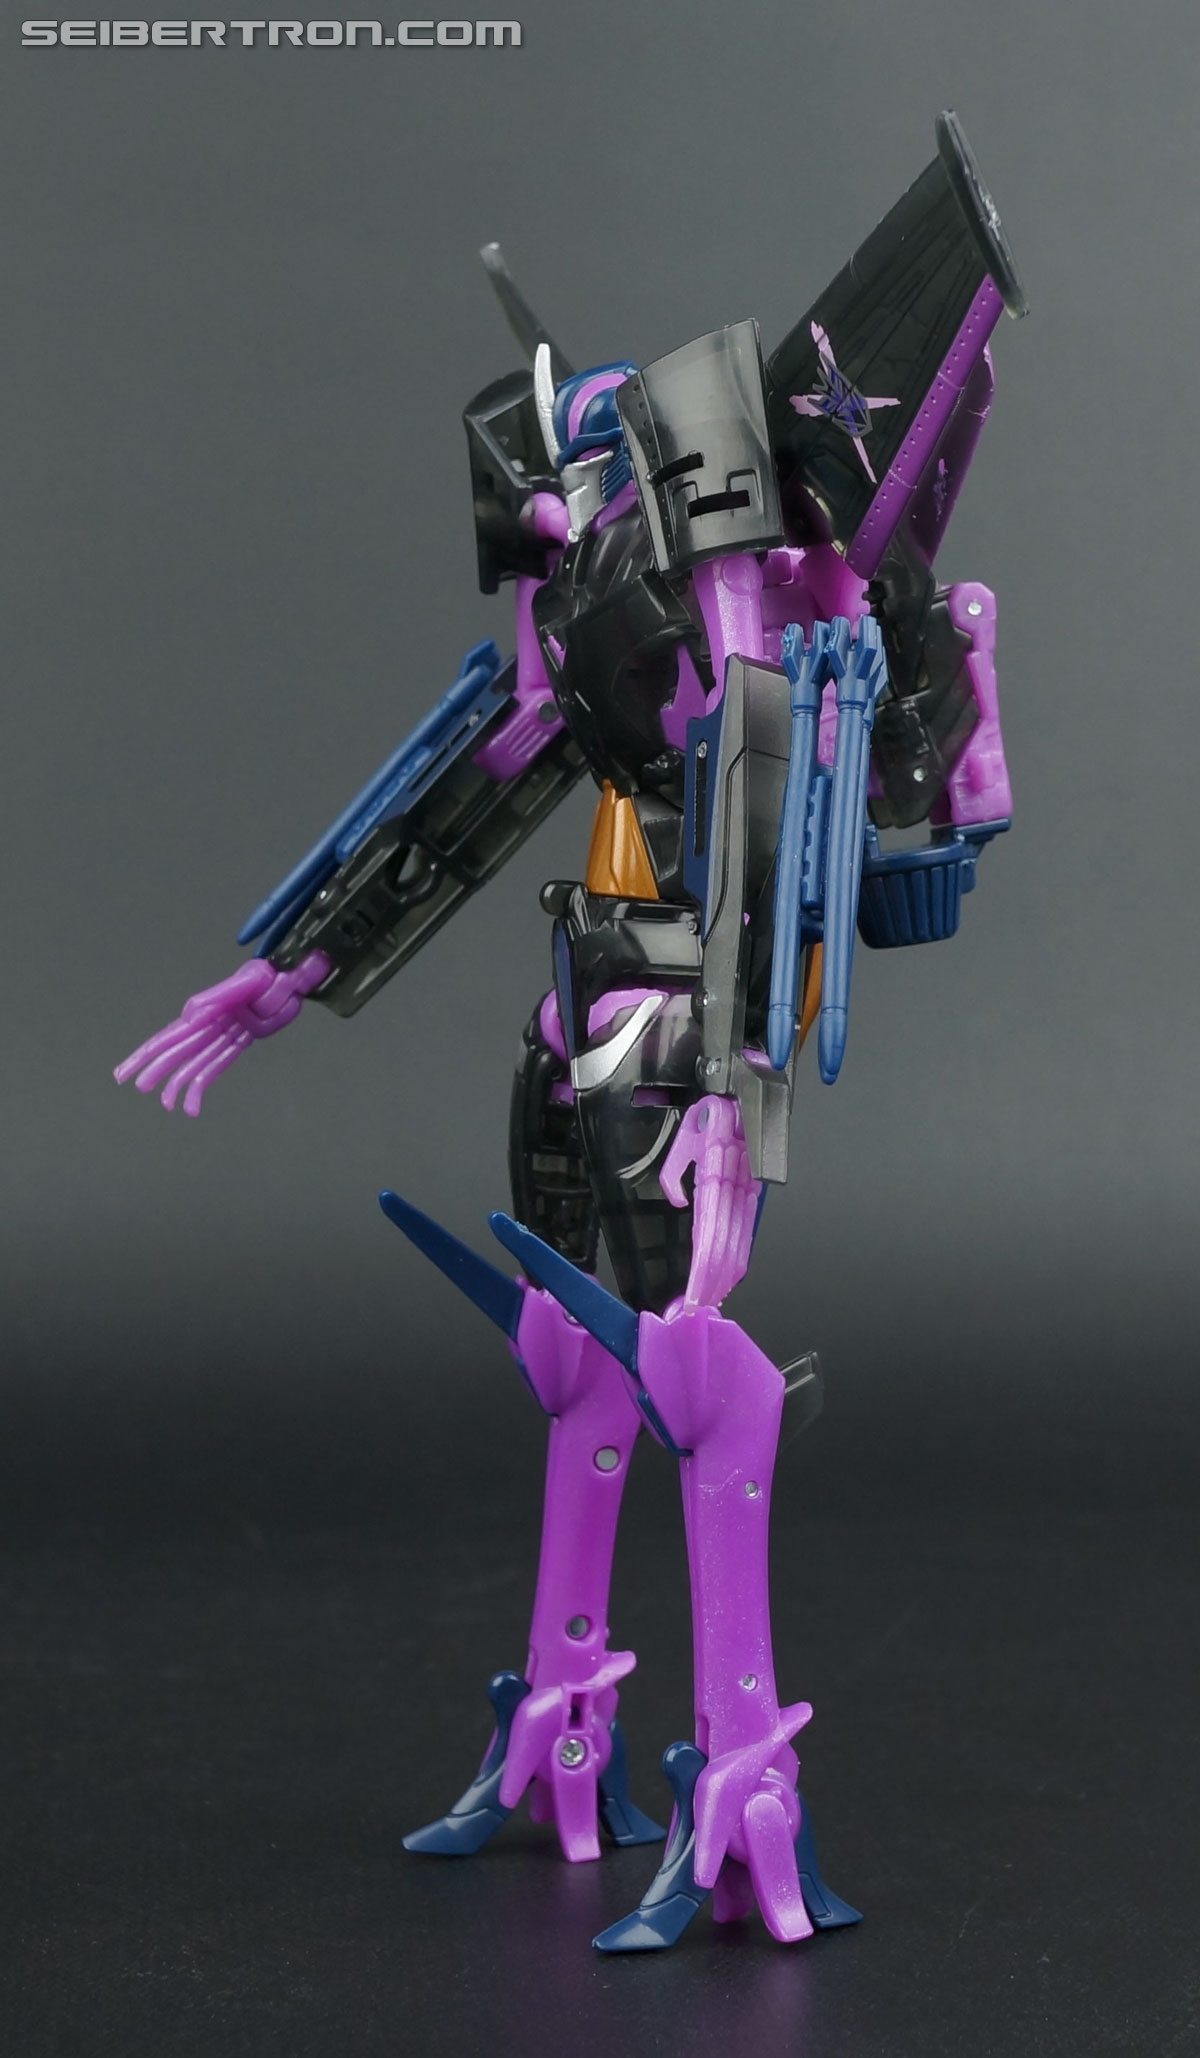 Transformers Prime: Robots In Disguise Dark Energon Starscream (Image #78 of 128)